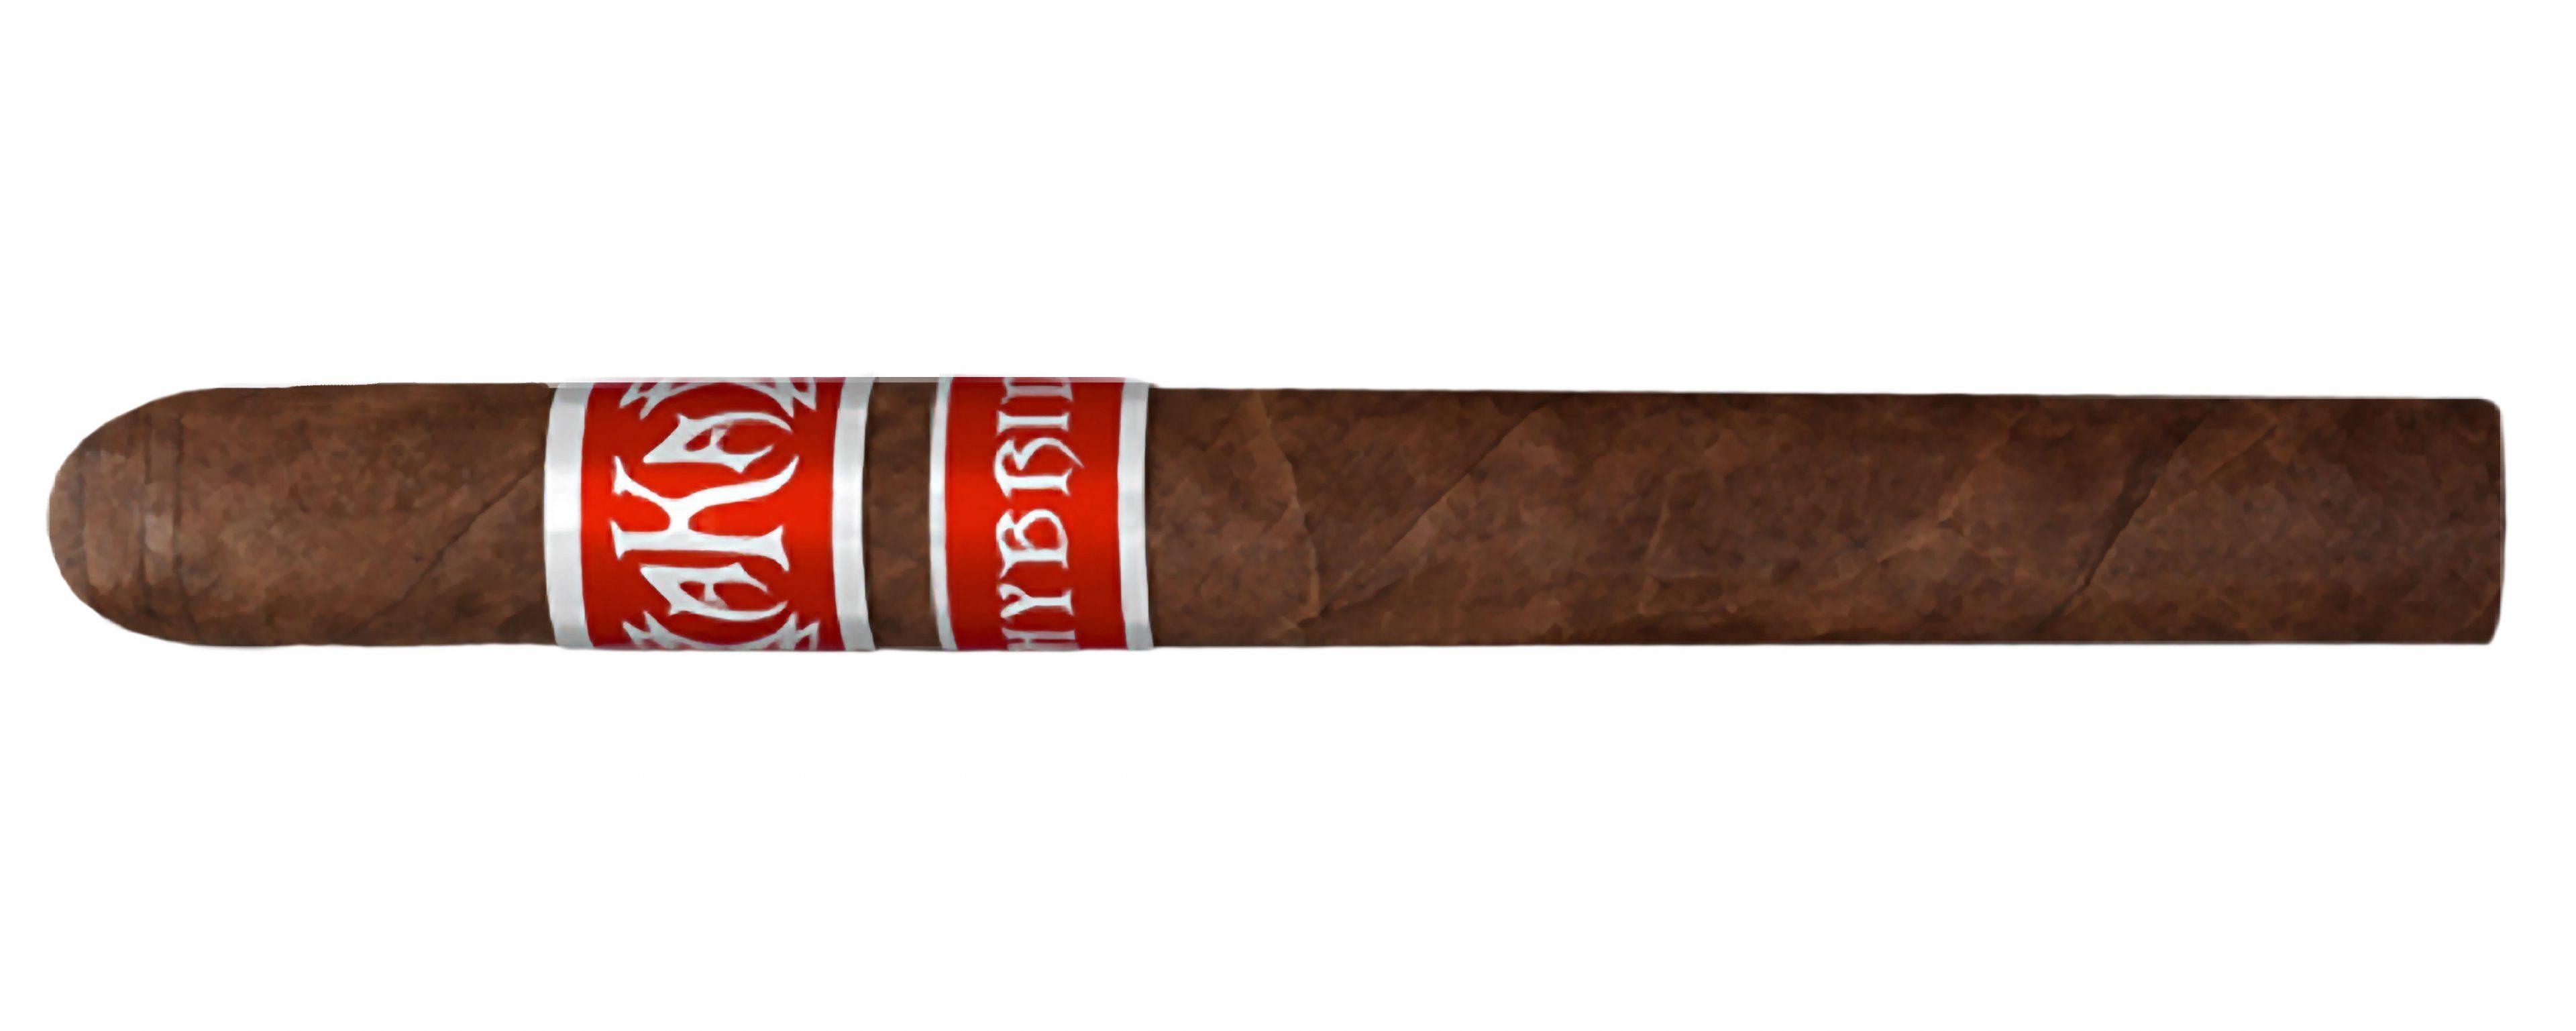 Quick Cigar Review: AKA Hybrid Corona Gorda